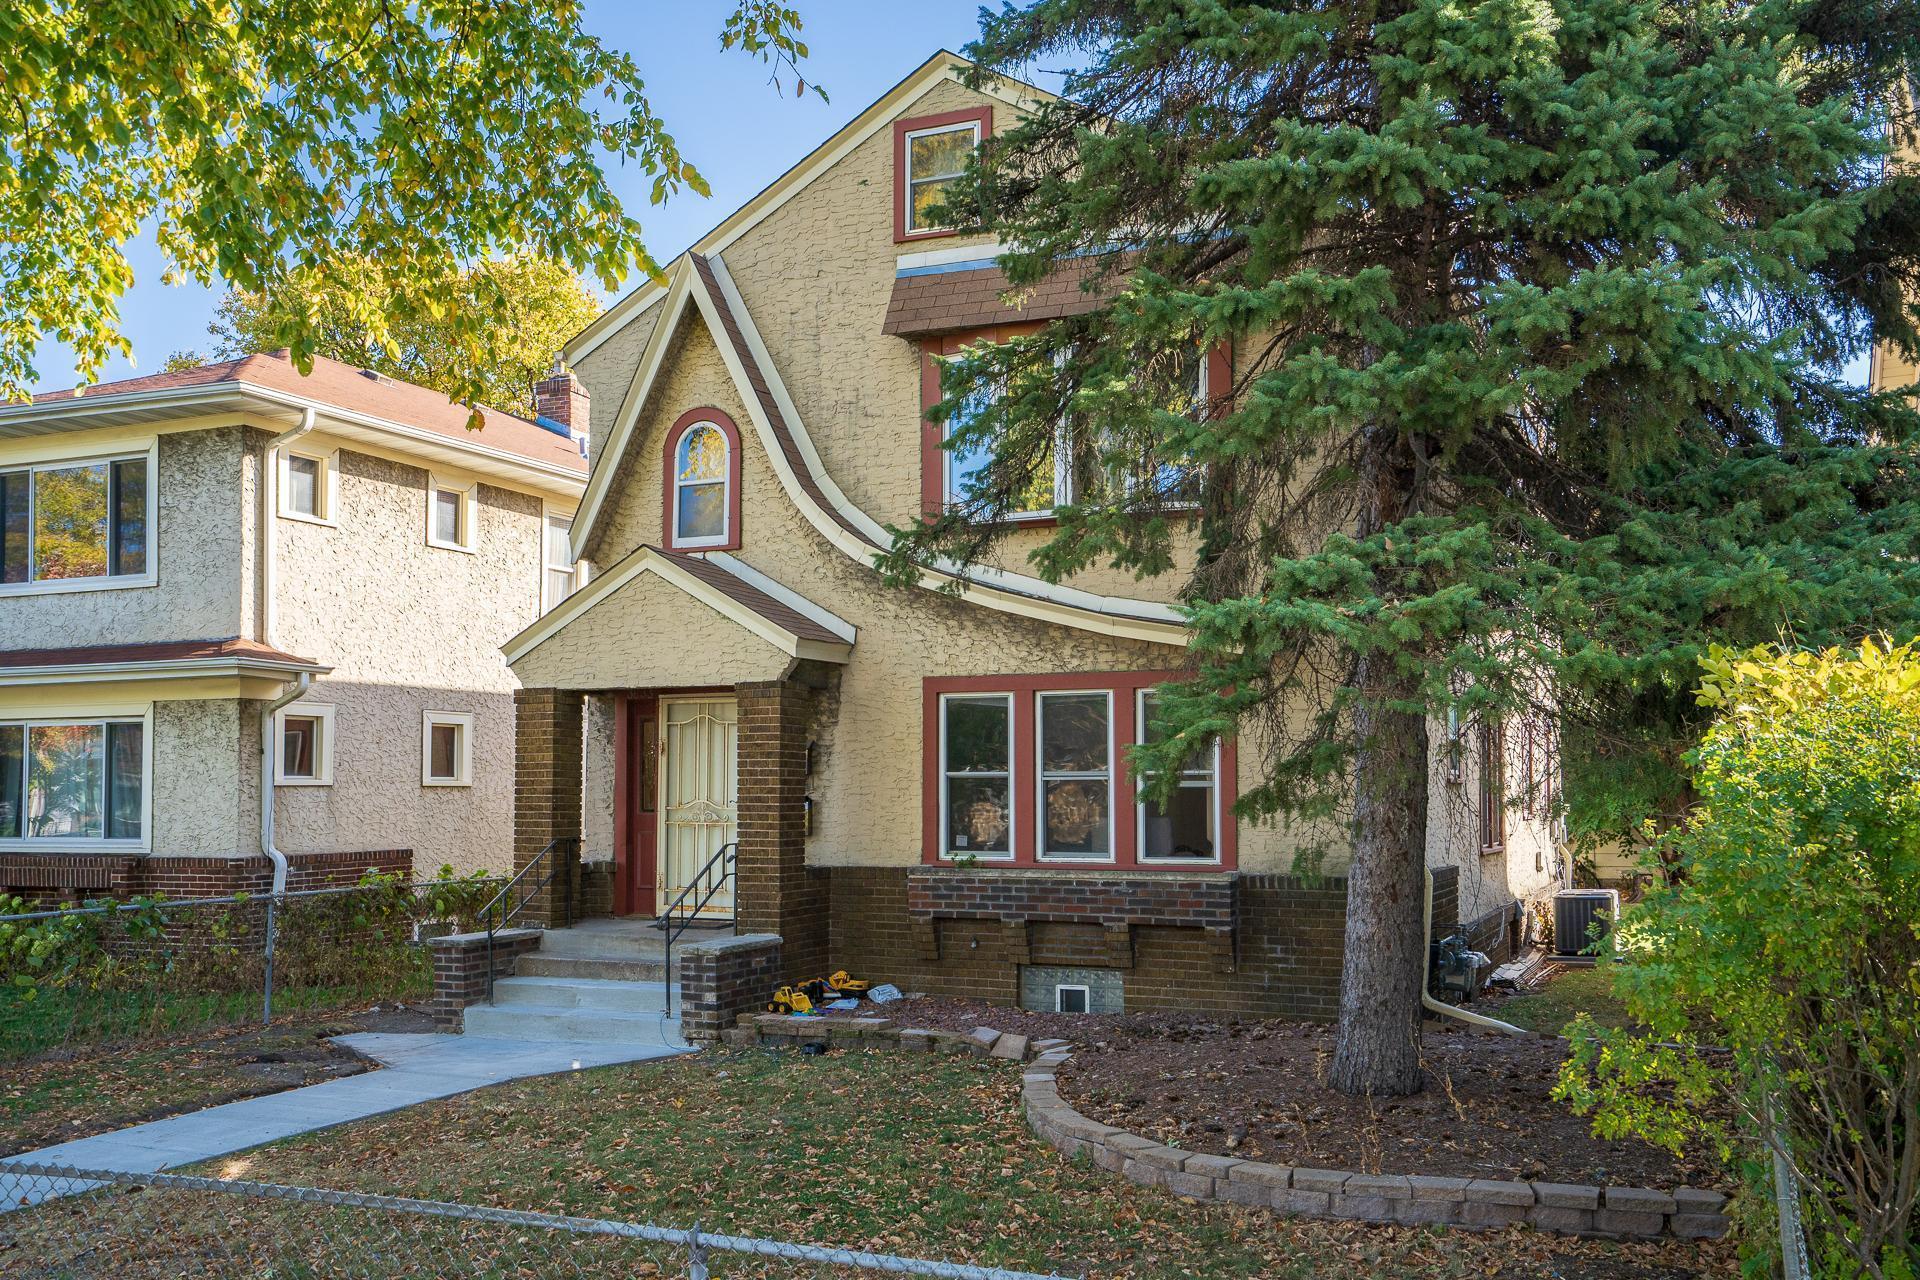 3633 3rd Avenue S Property Photo - Minneapolis, MN real estate listing